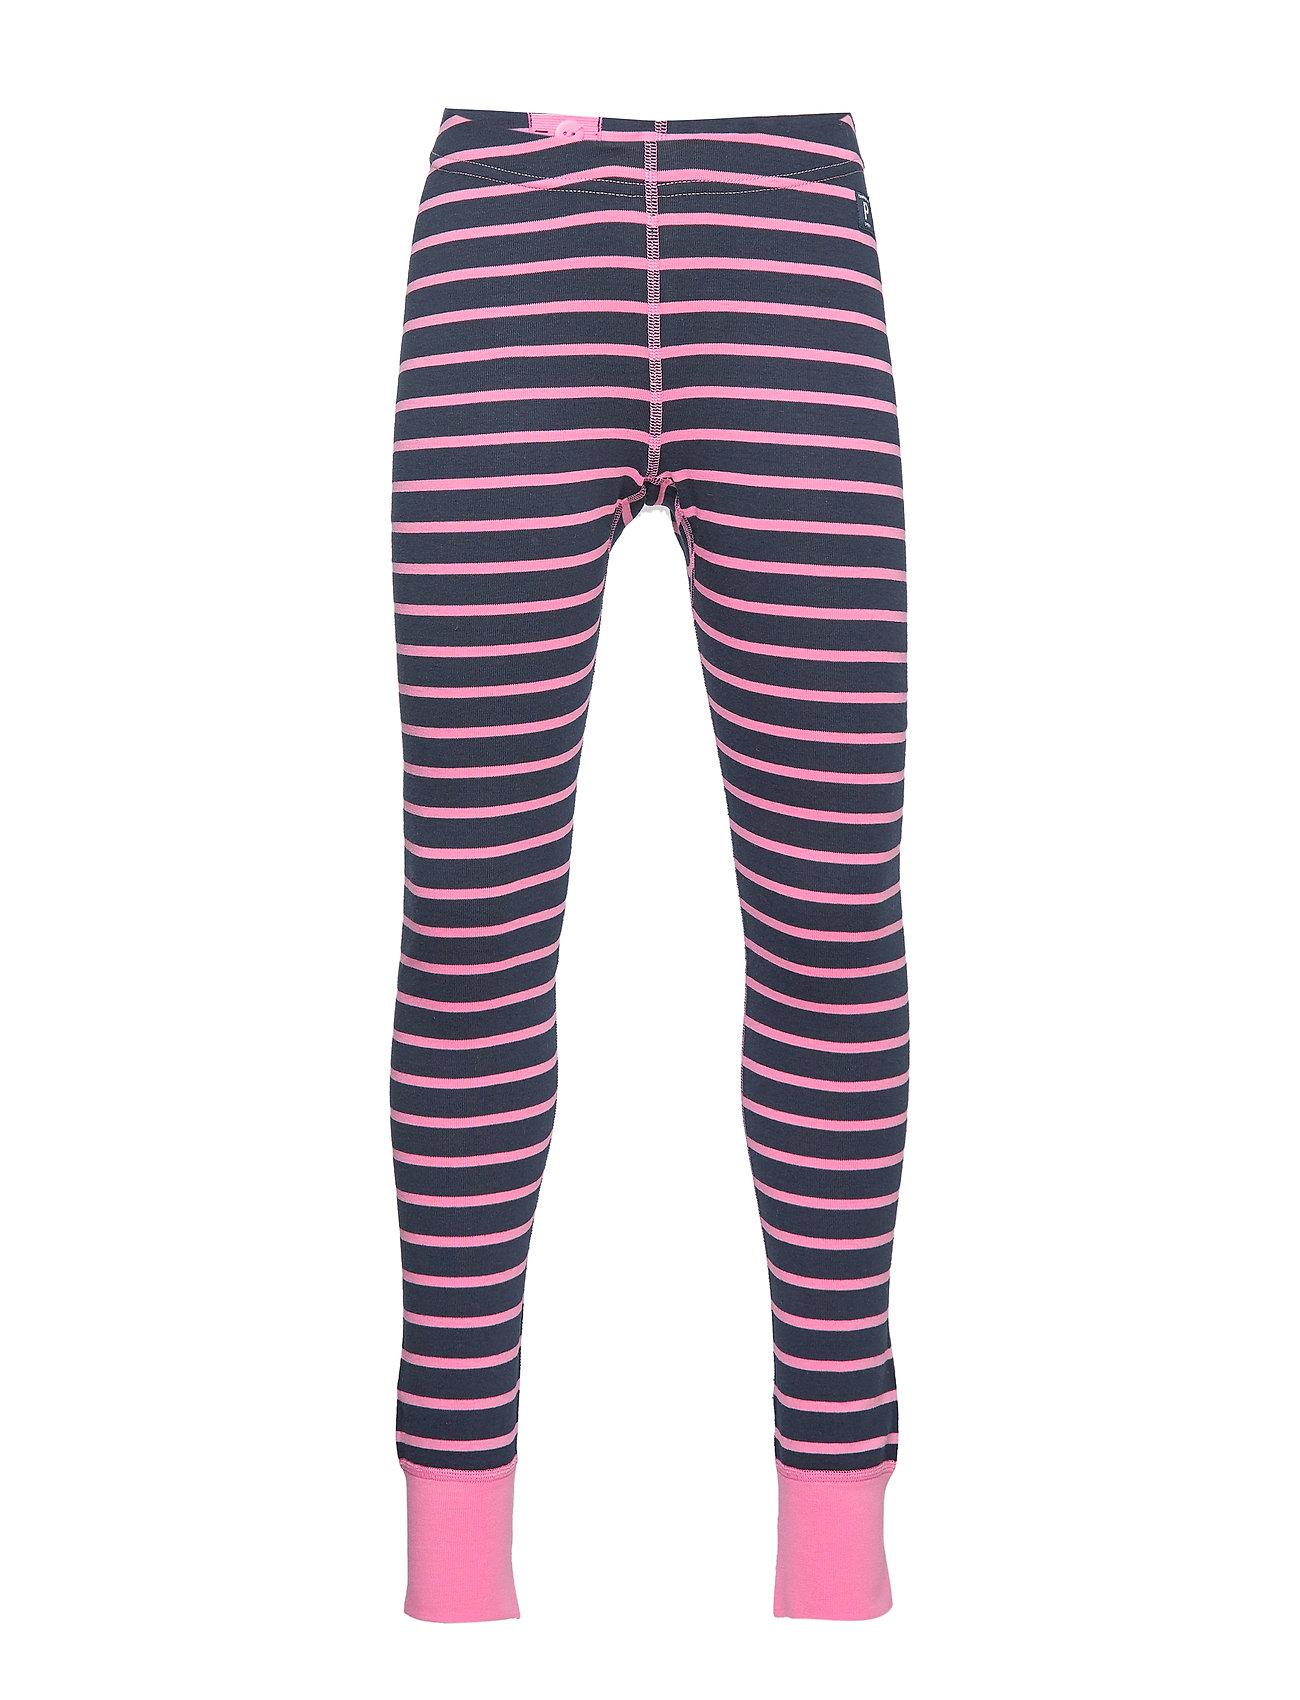 Polarn O. Pyret Long Johns Striped Preschool - MORNING GLORY